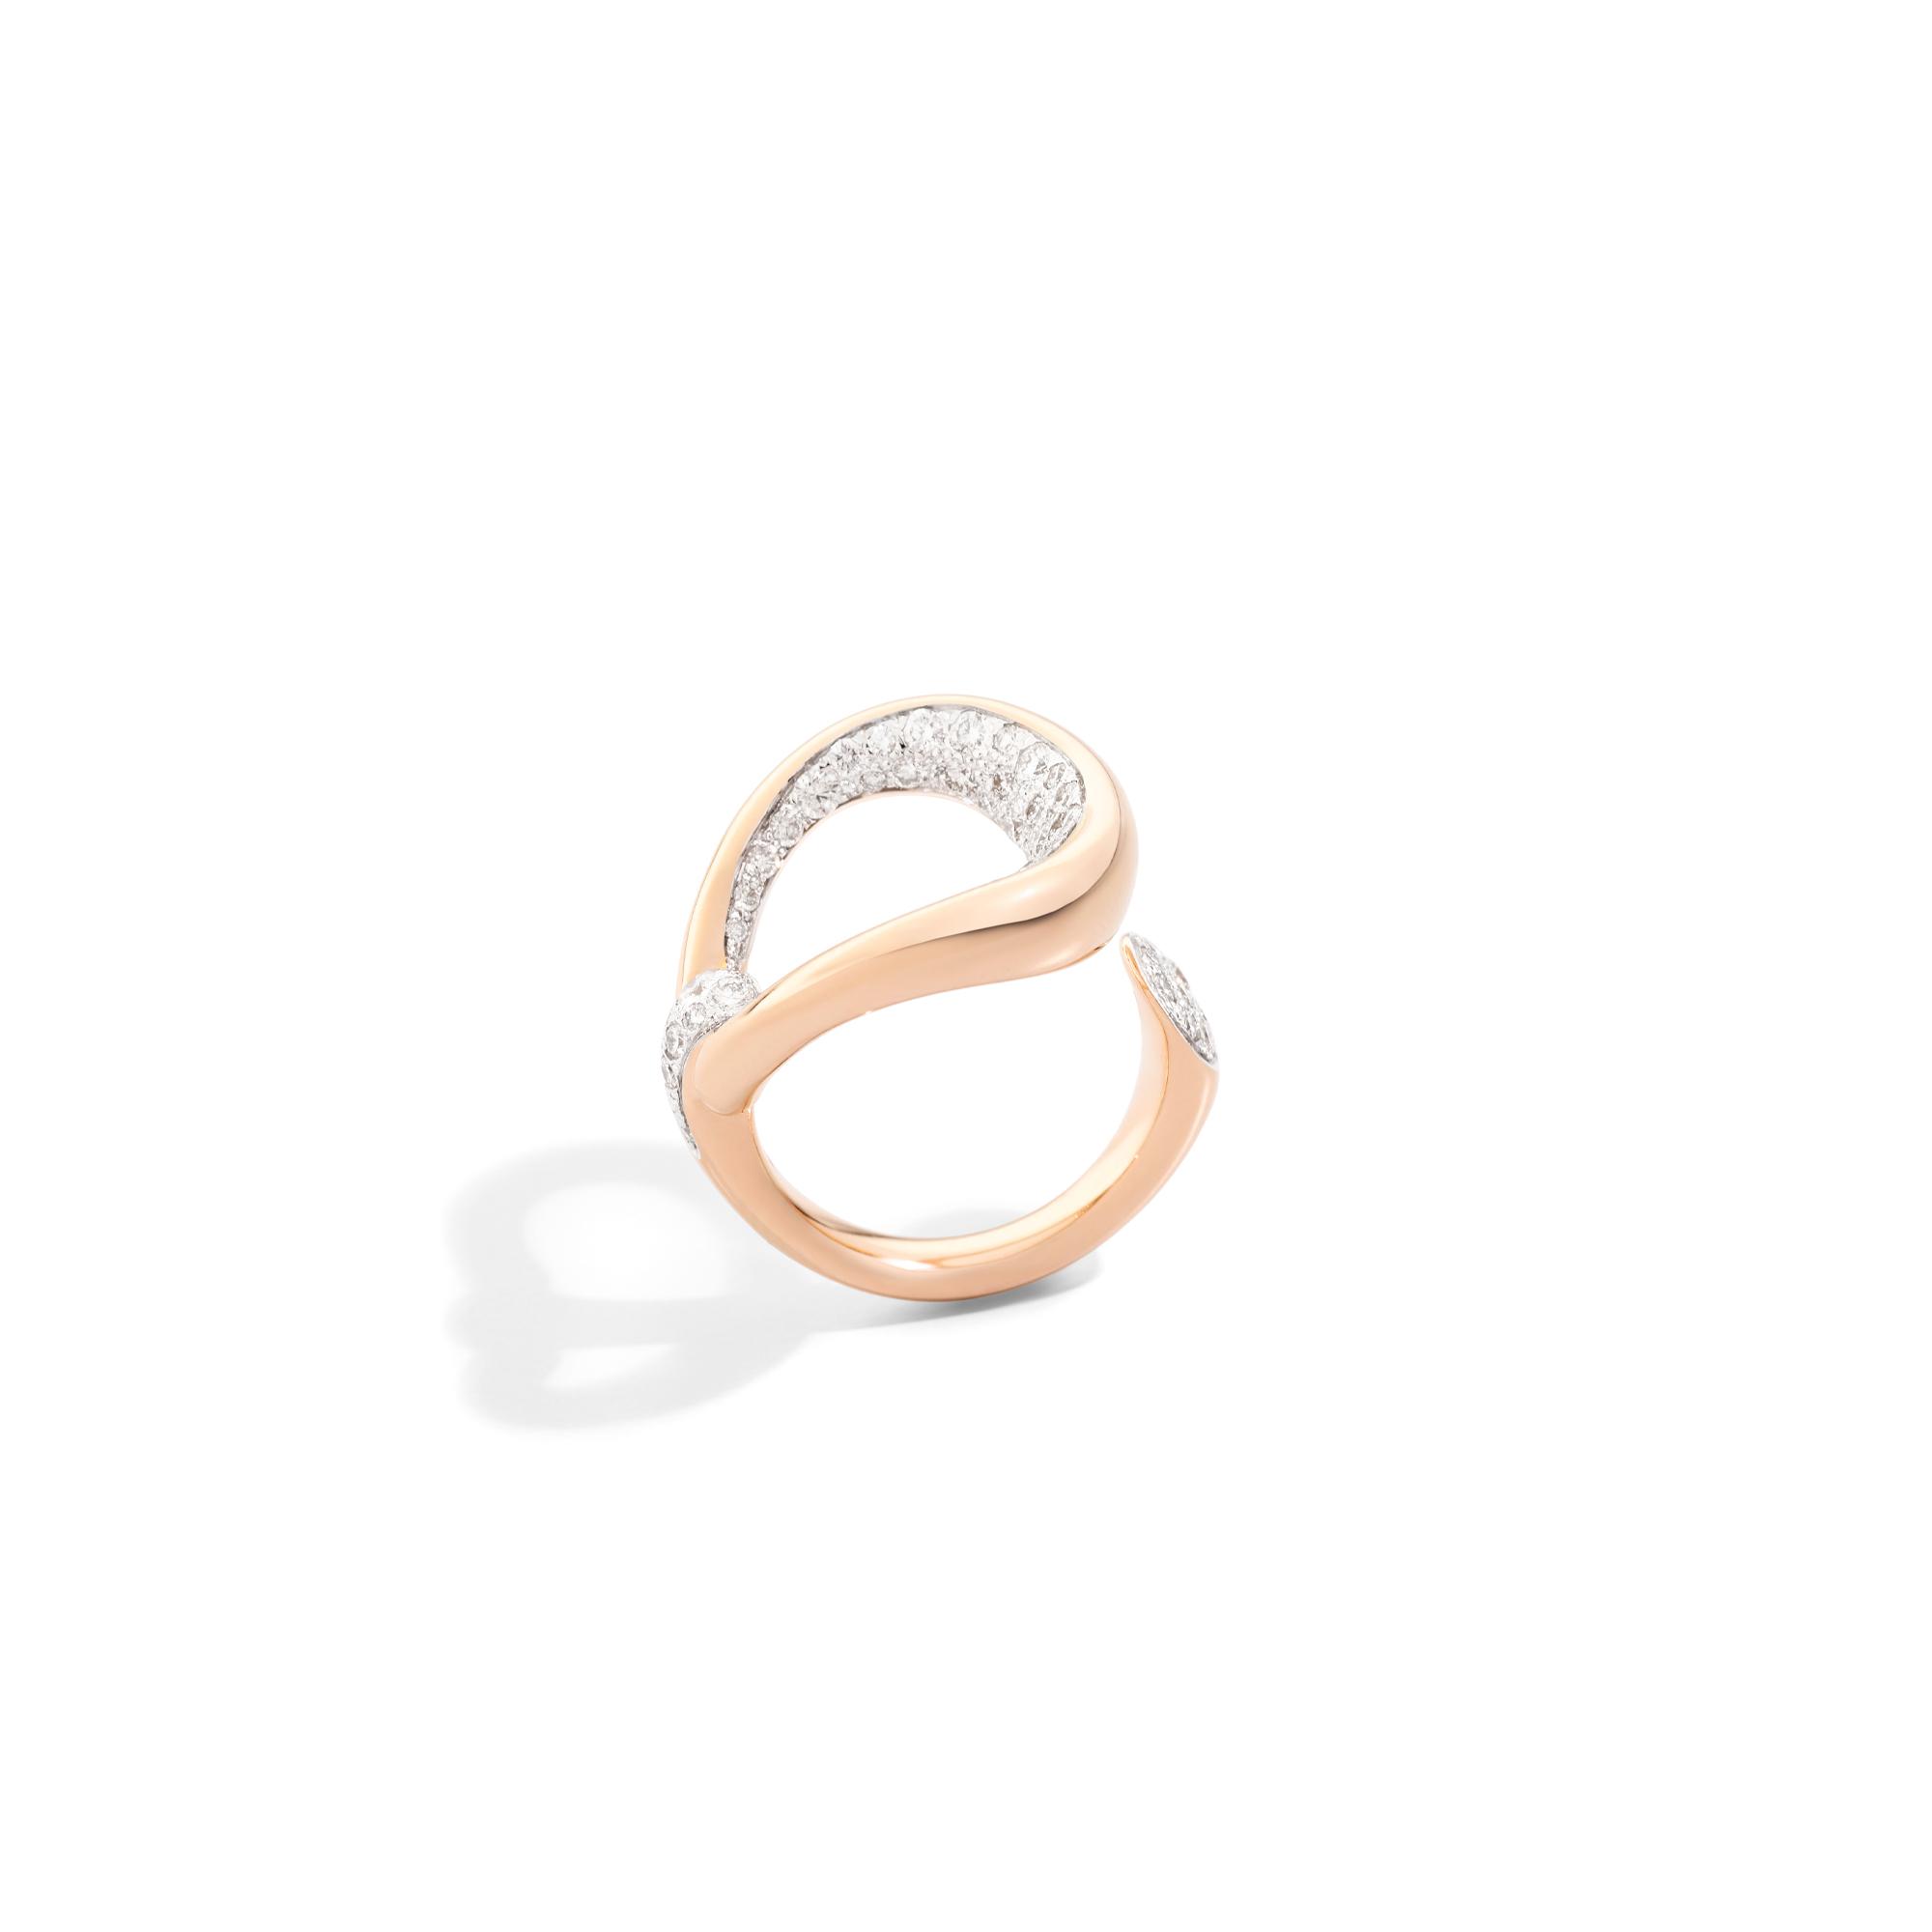 Pomellato Fantina Ring aus Roségold mit Brillanten